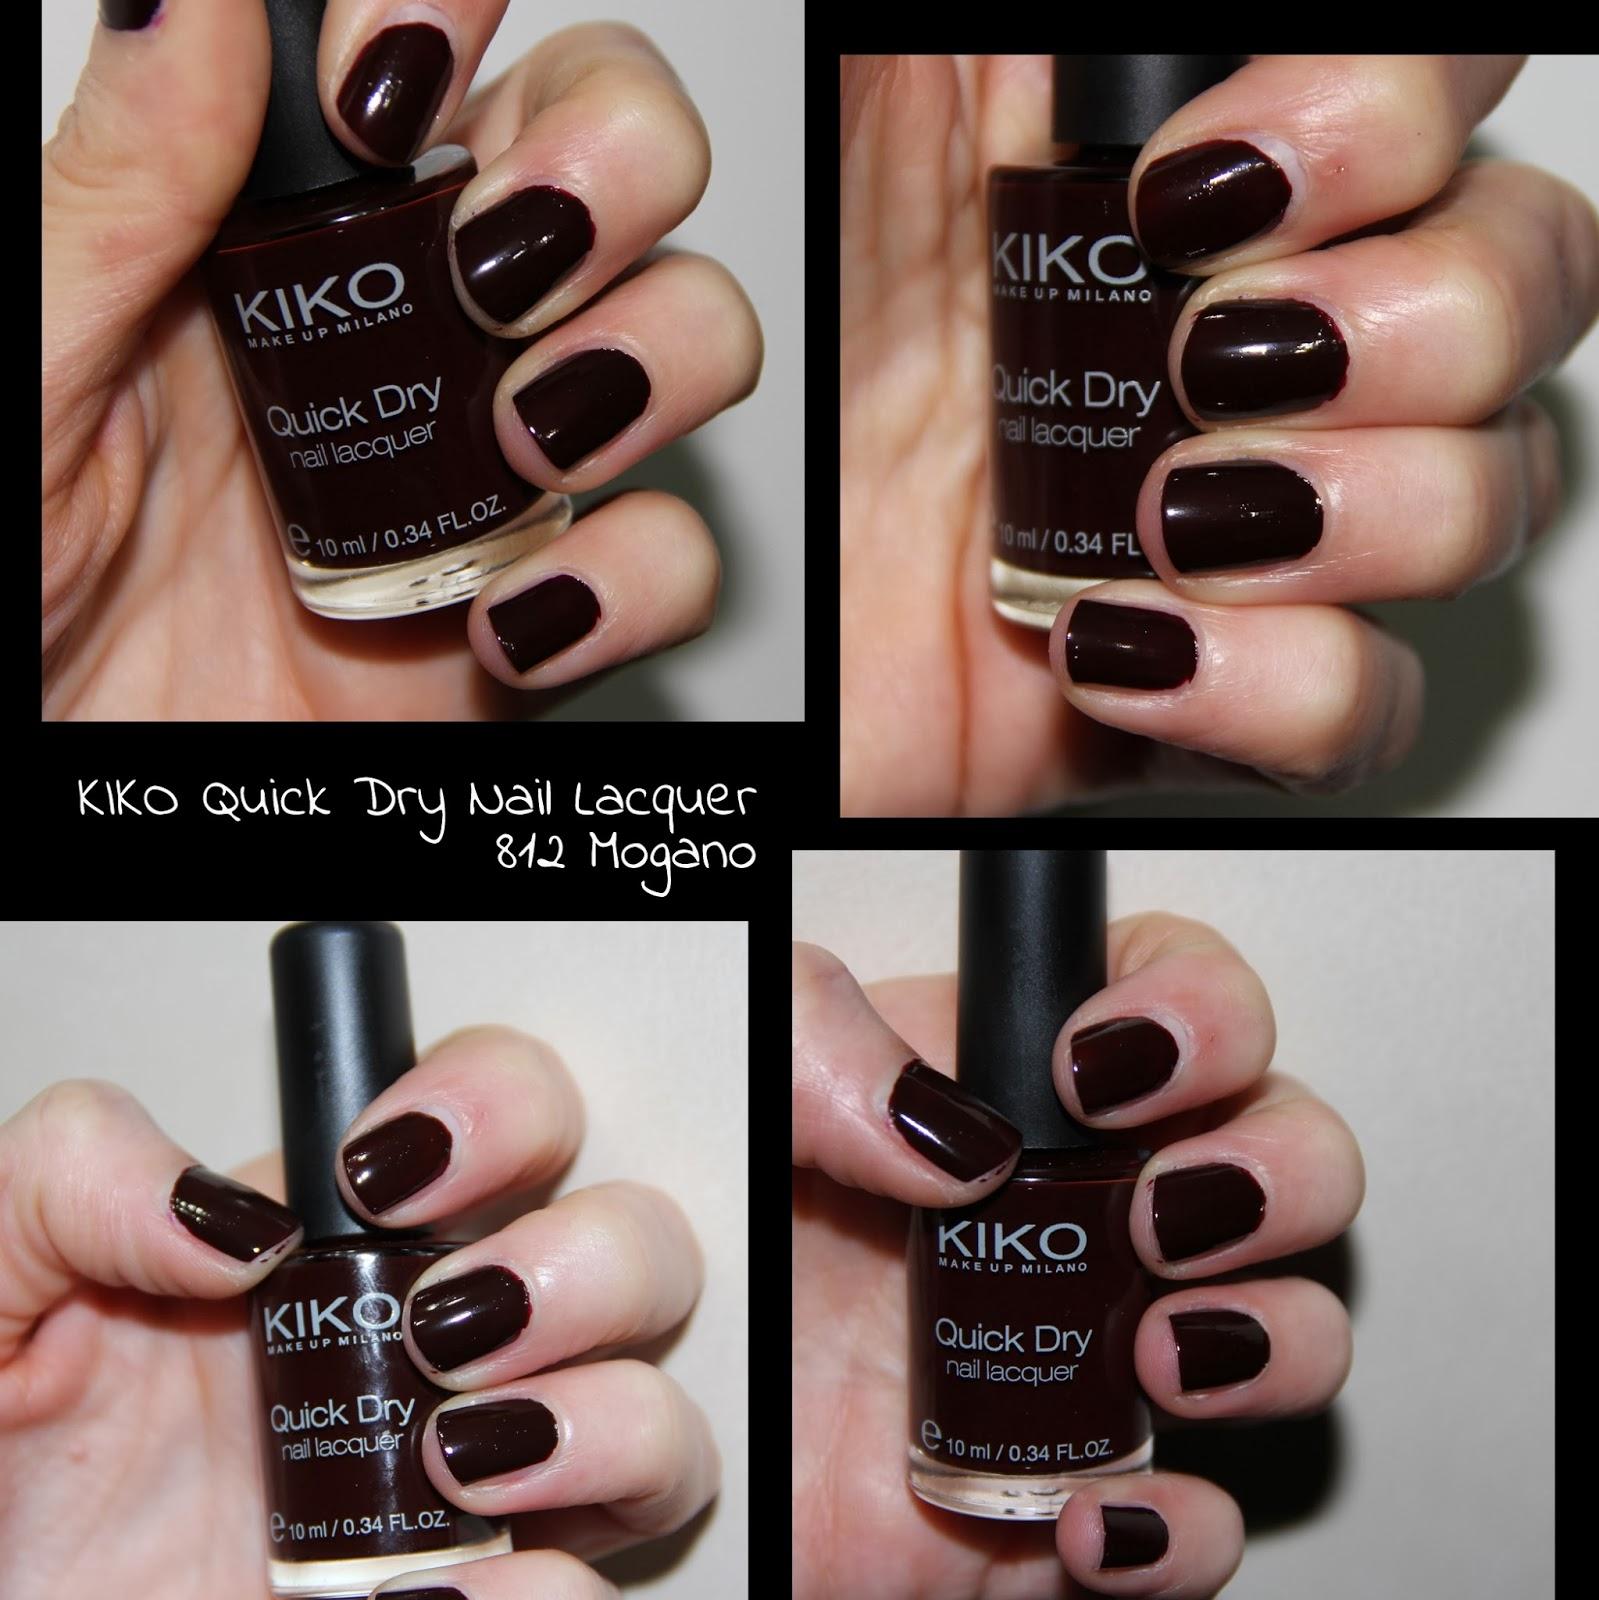 MichelaIsMyName: NOTD // KIKO Quick Dry Nail Lacquer 812 Mogano